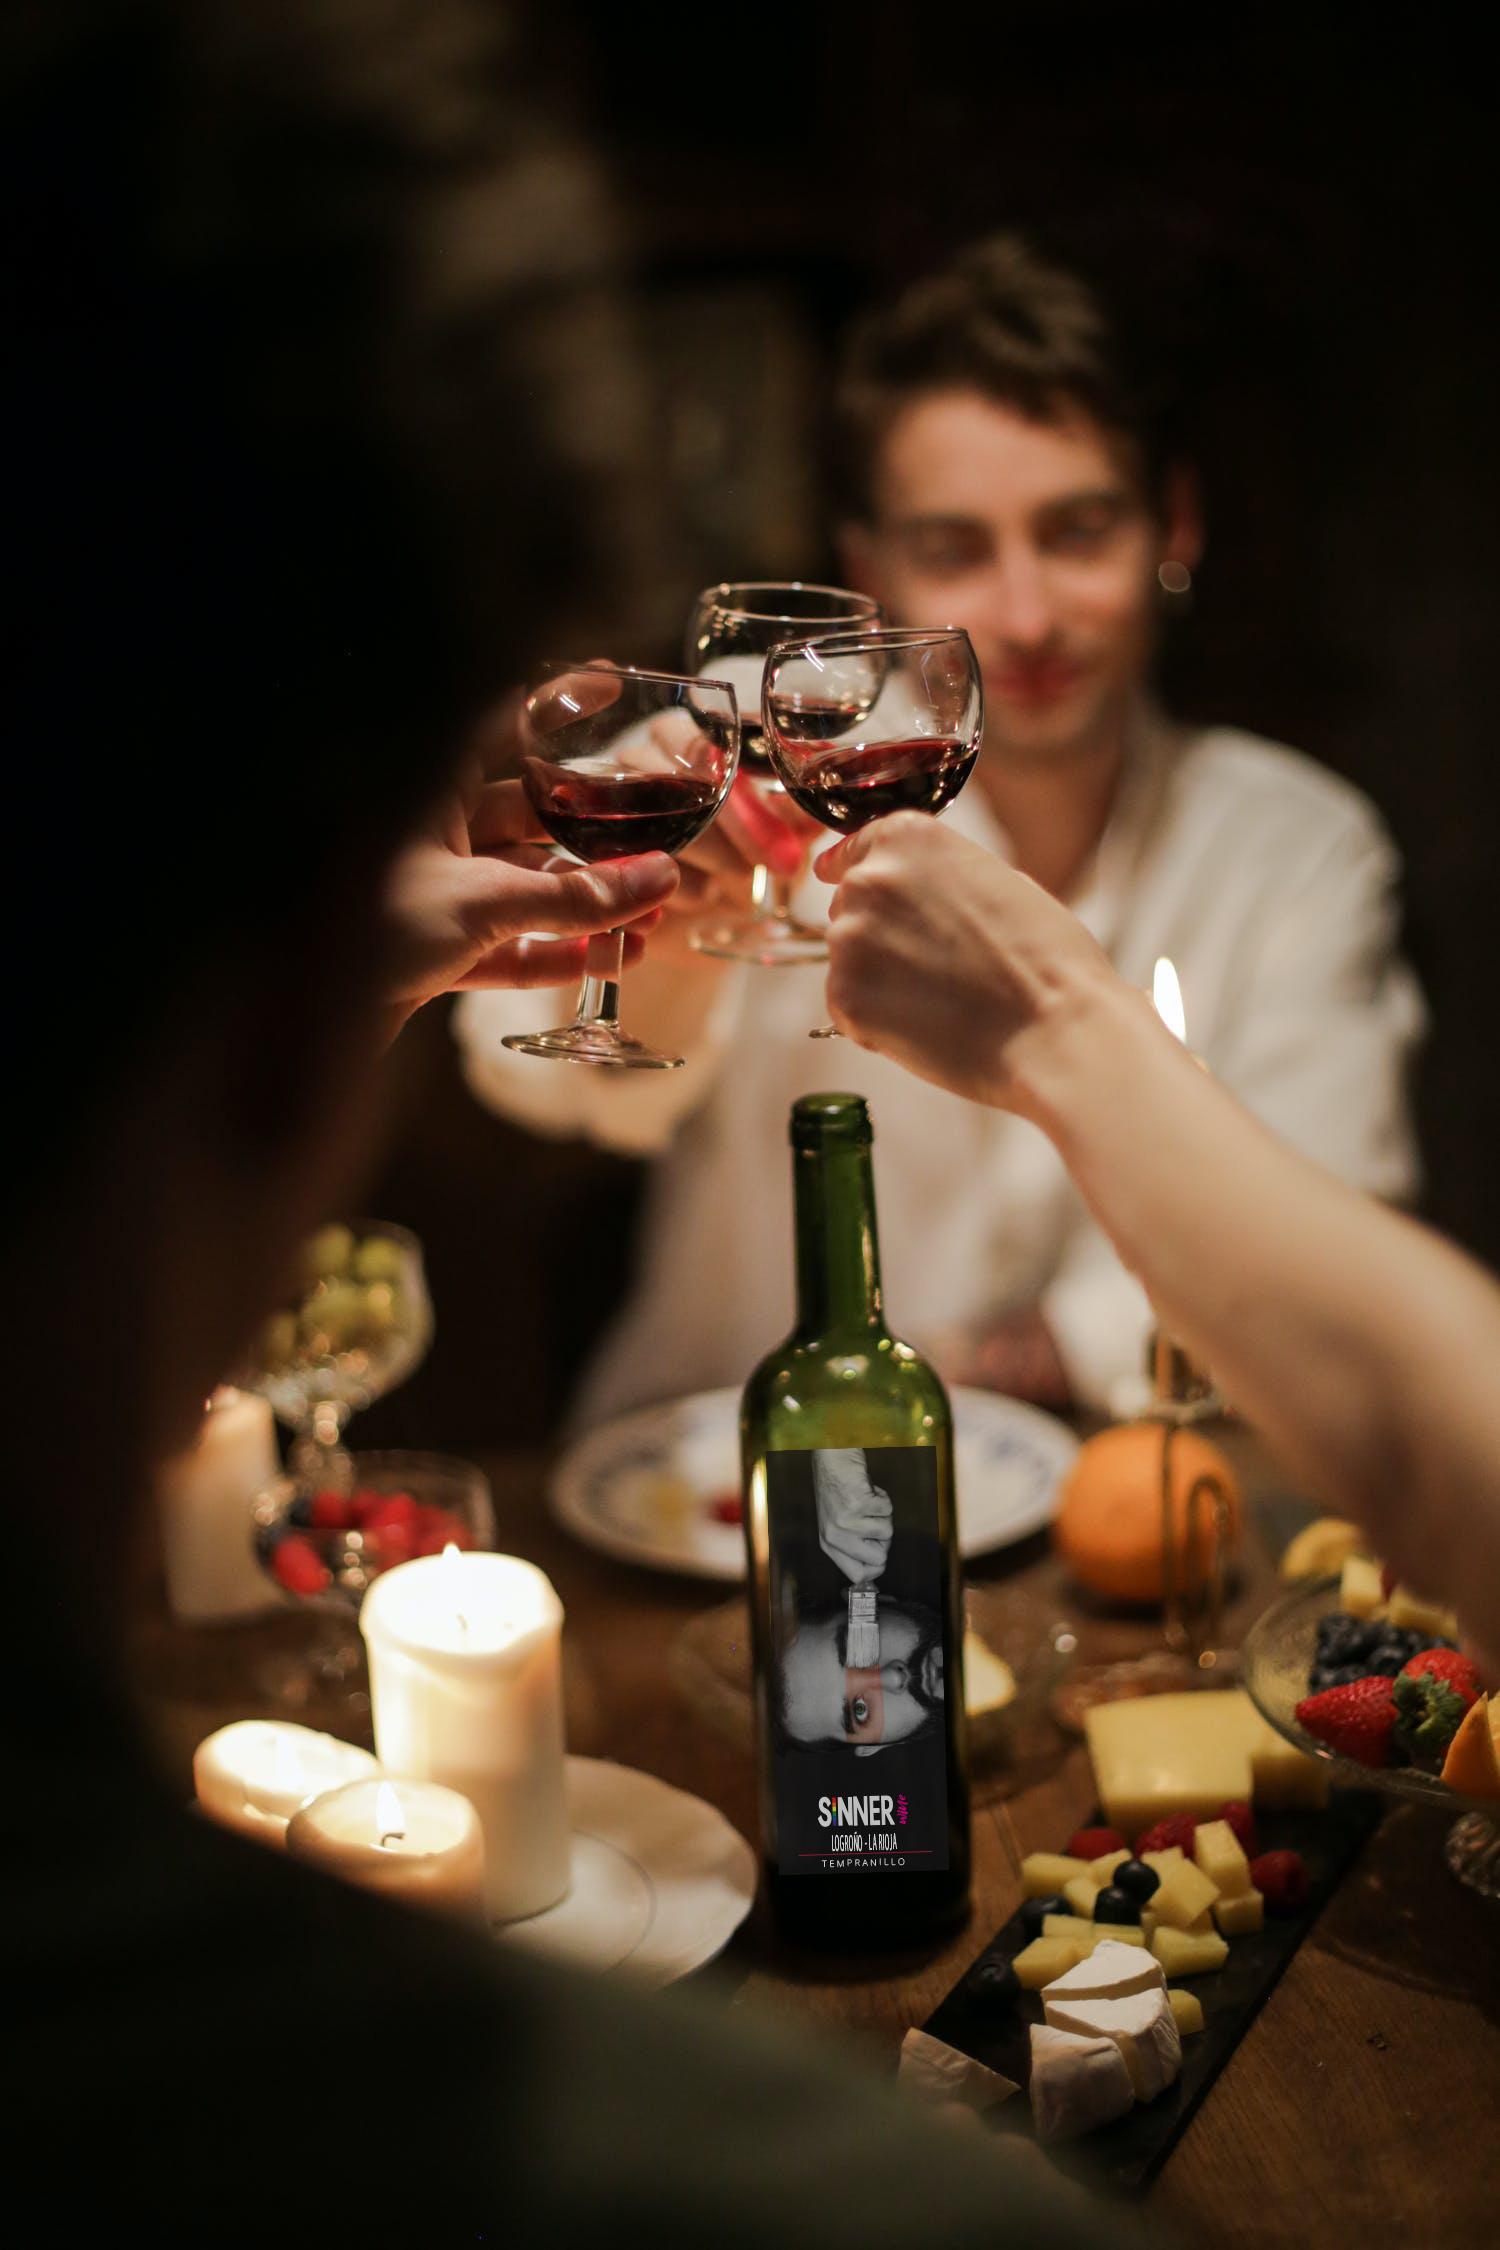 sinner-wine-rioja